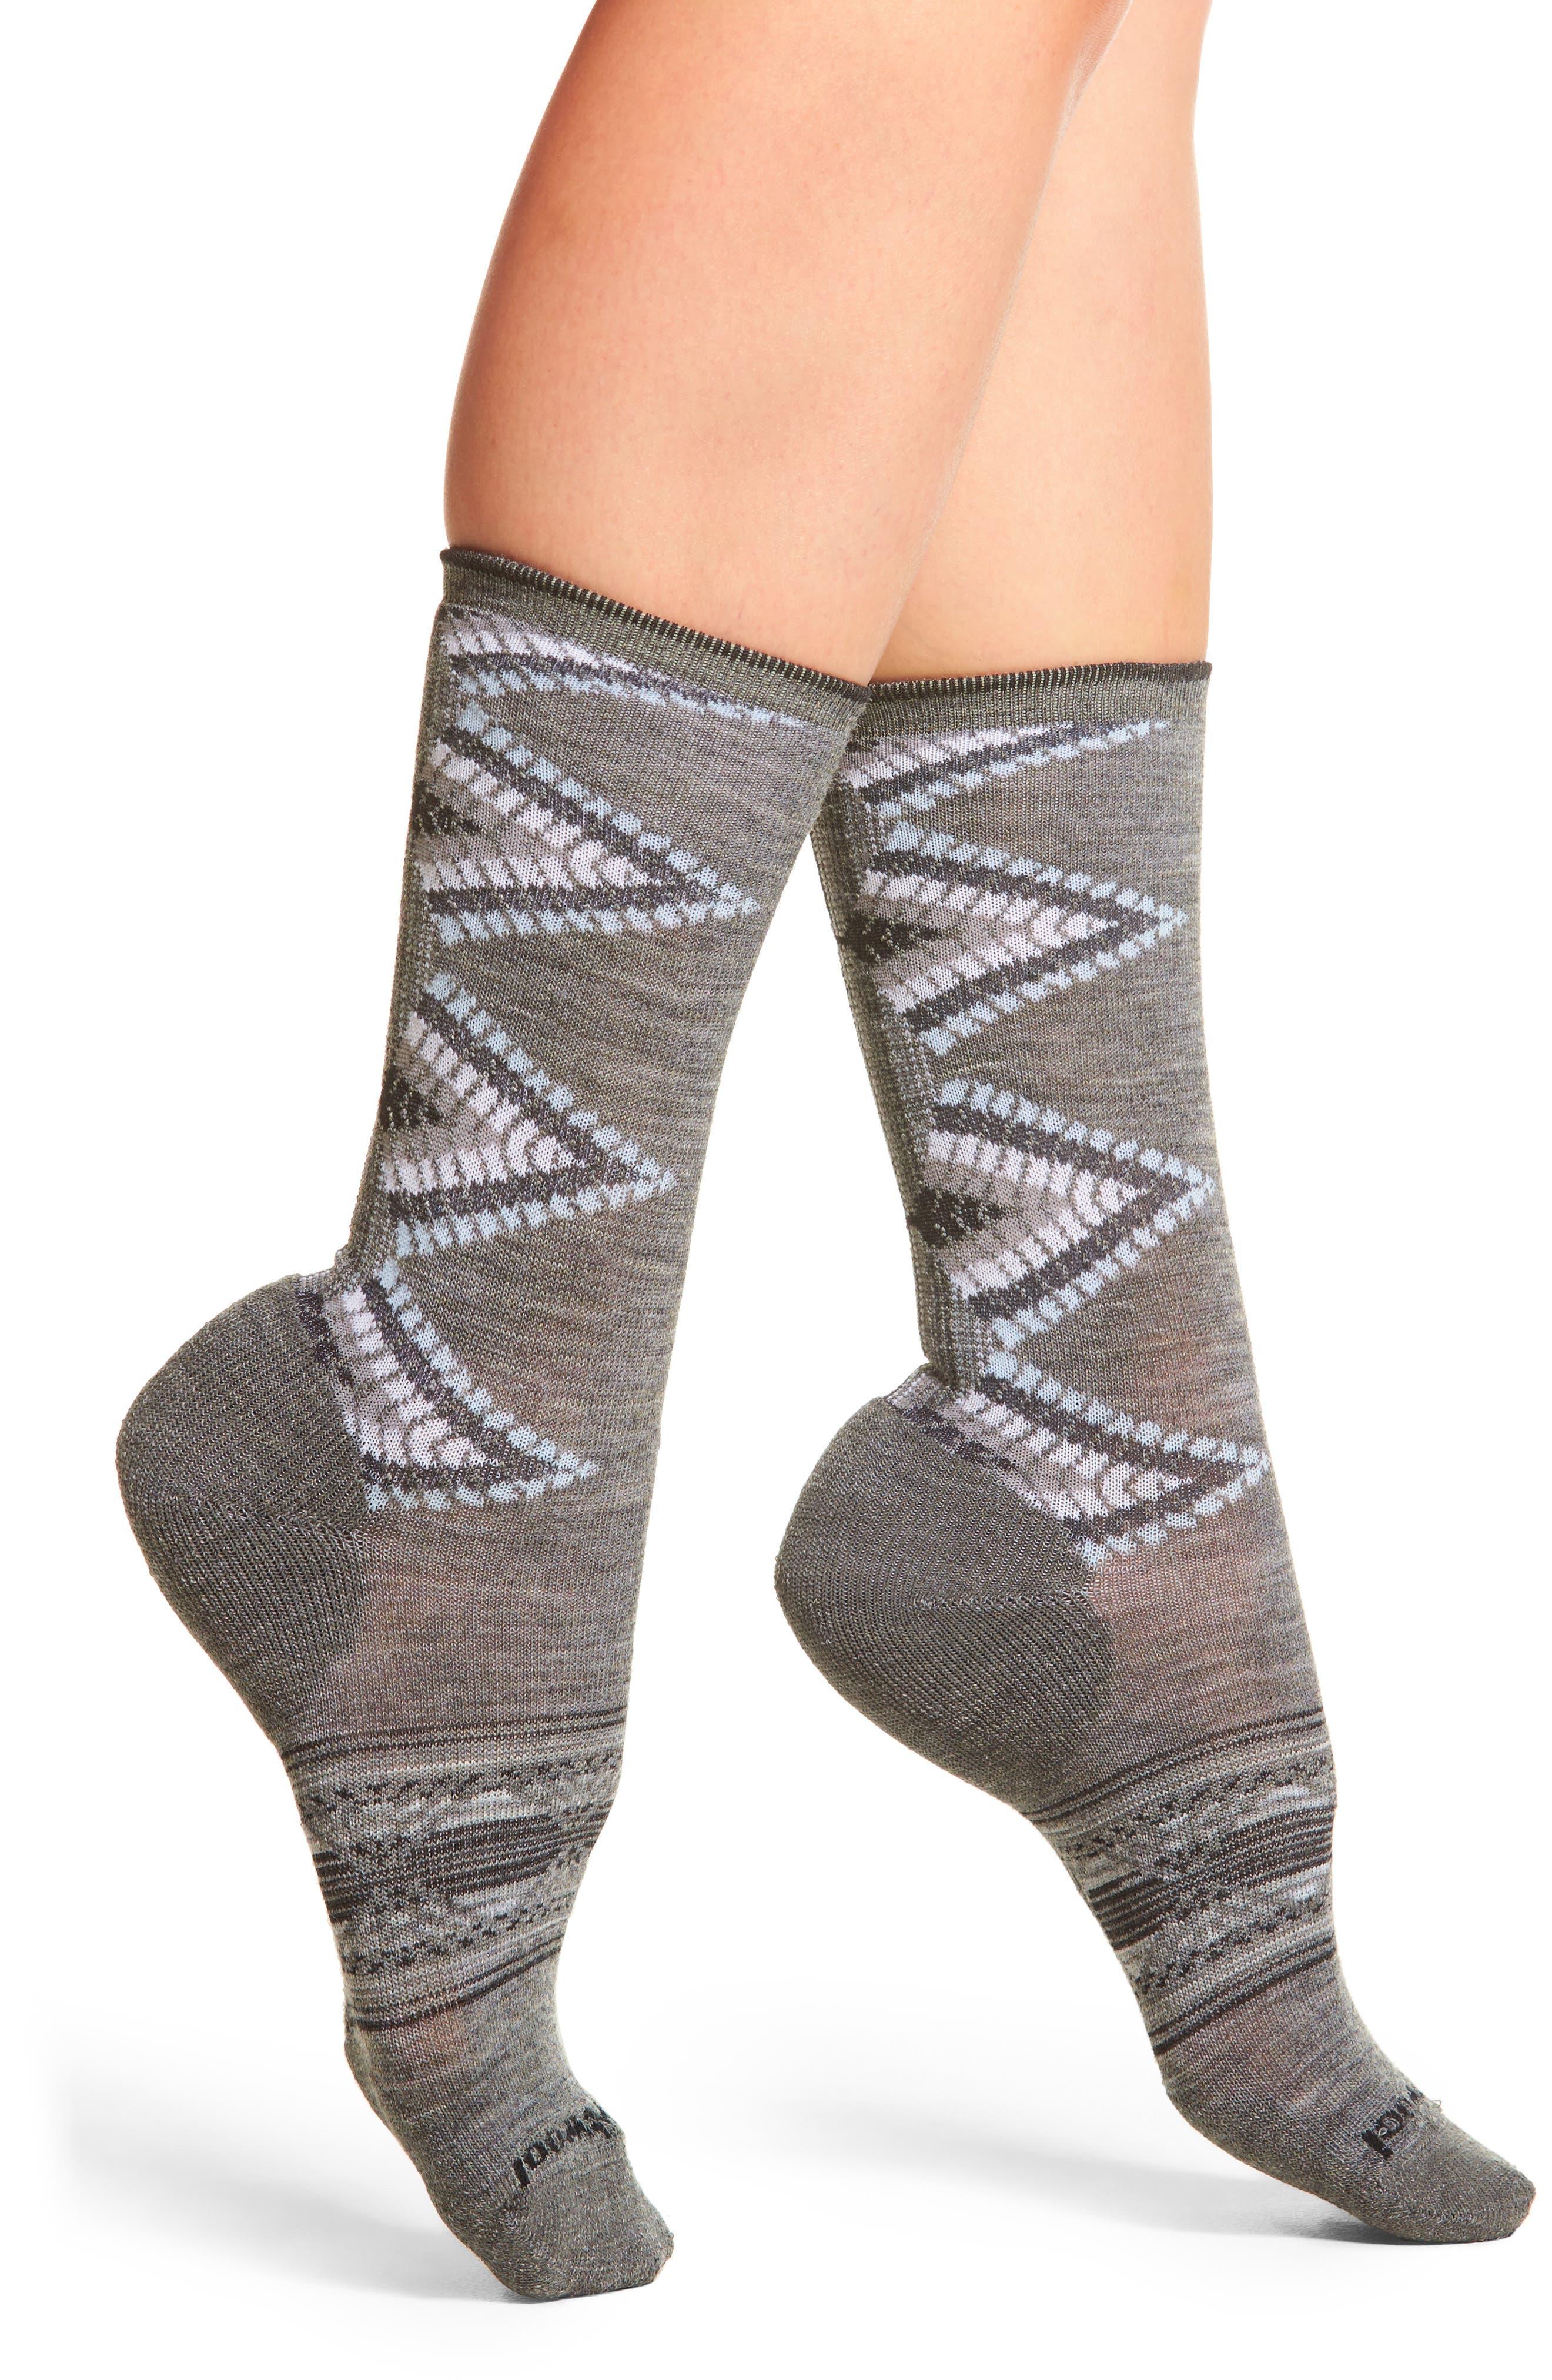 Tiva Crew Socks,                             Main thumbnail 1, color,                             Medium Gray Heather